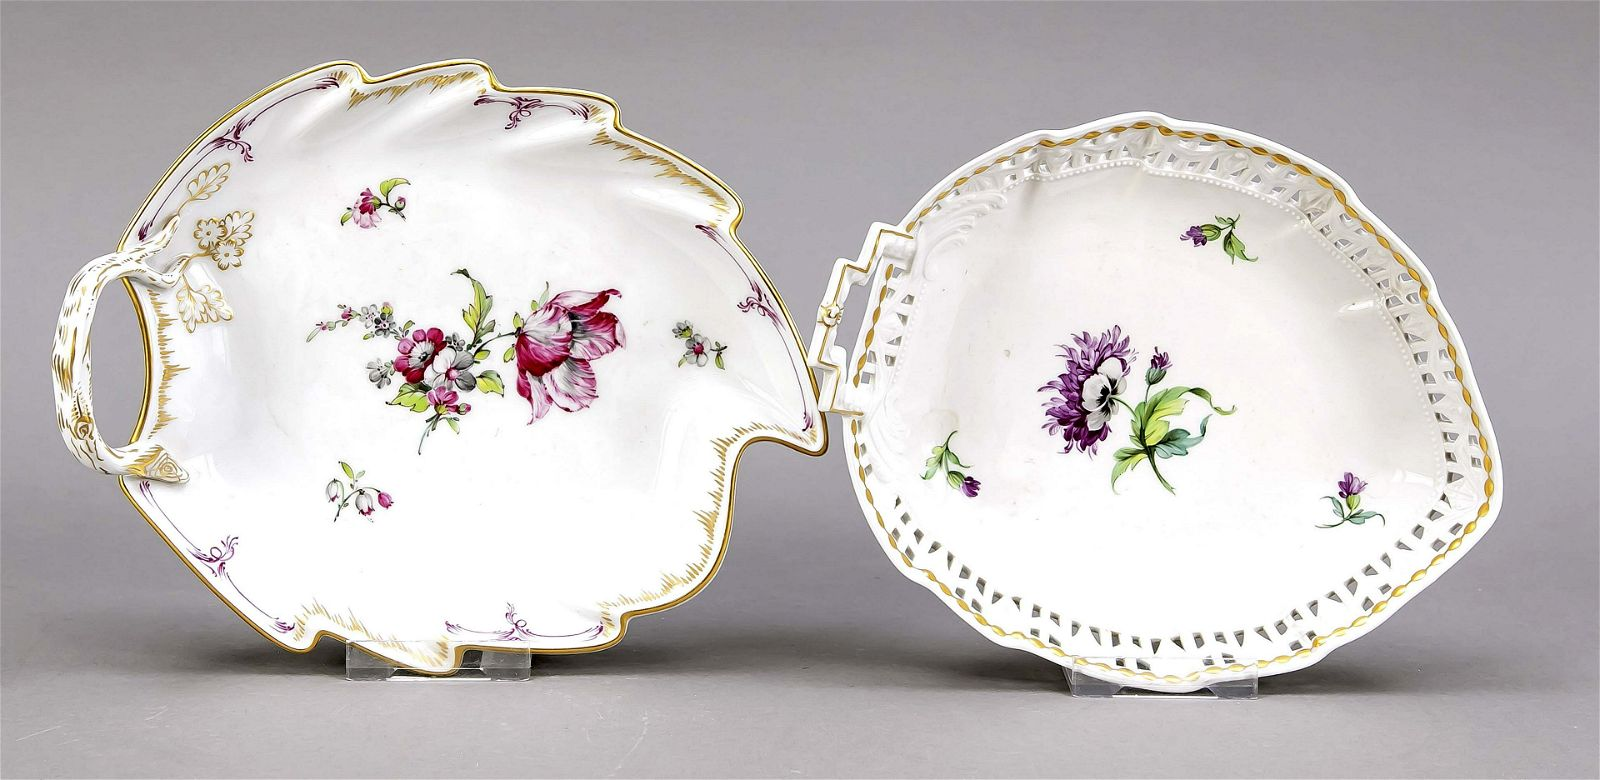 Two leaf bowls, KPM Berlin, marks 19